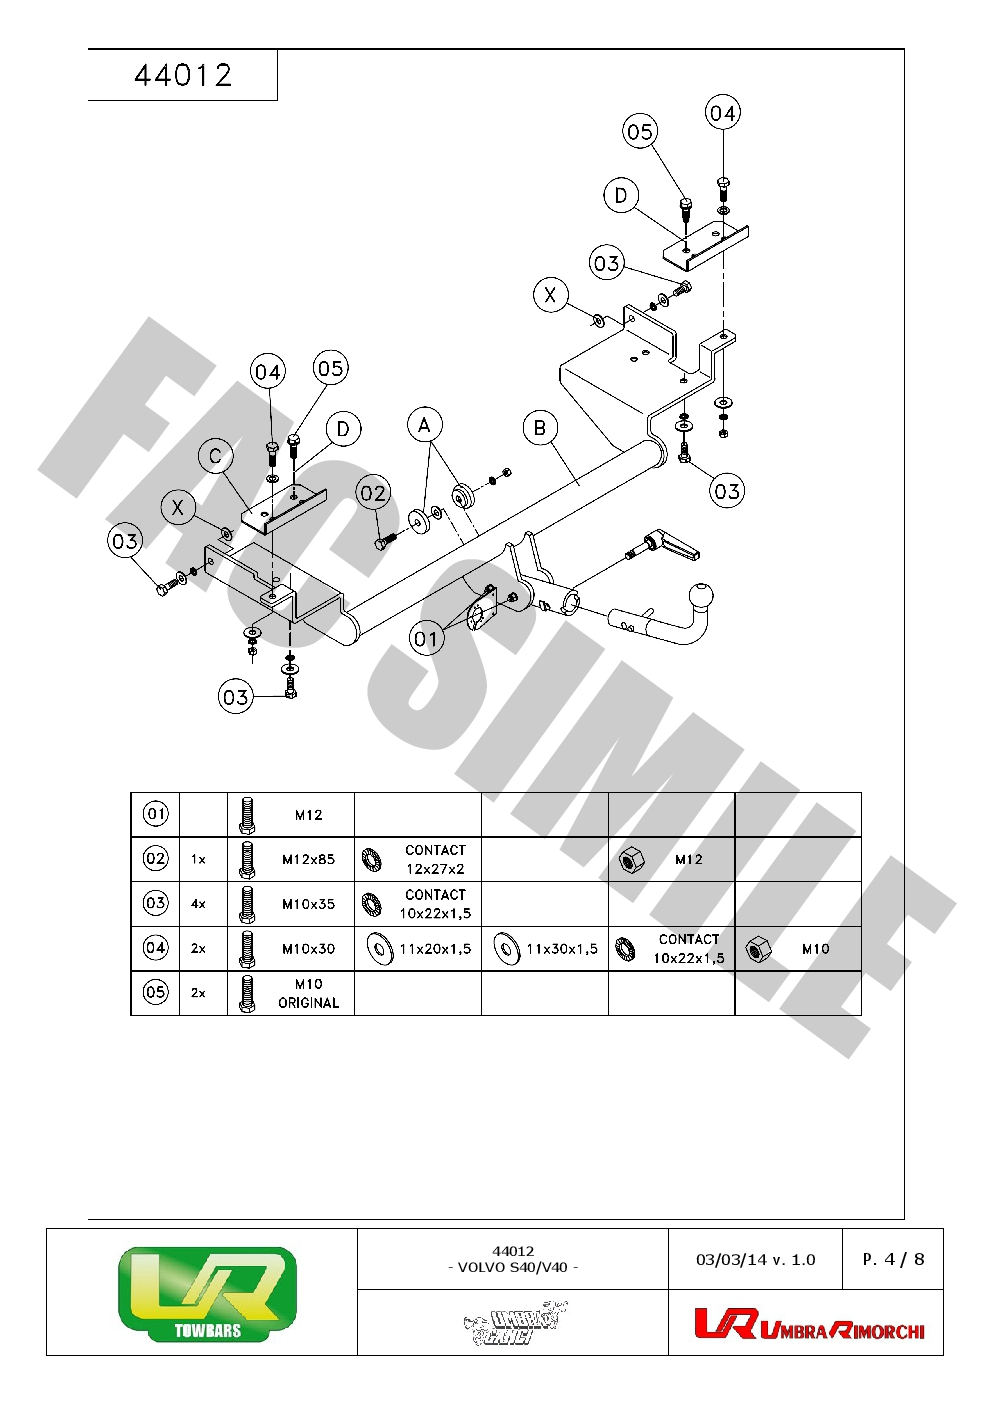 Detach Towbar + 13p C2 Wiring Kit fits Volvo V40 ESTATE